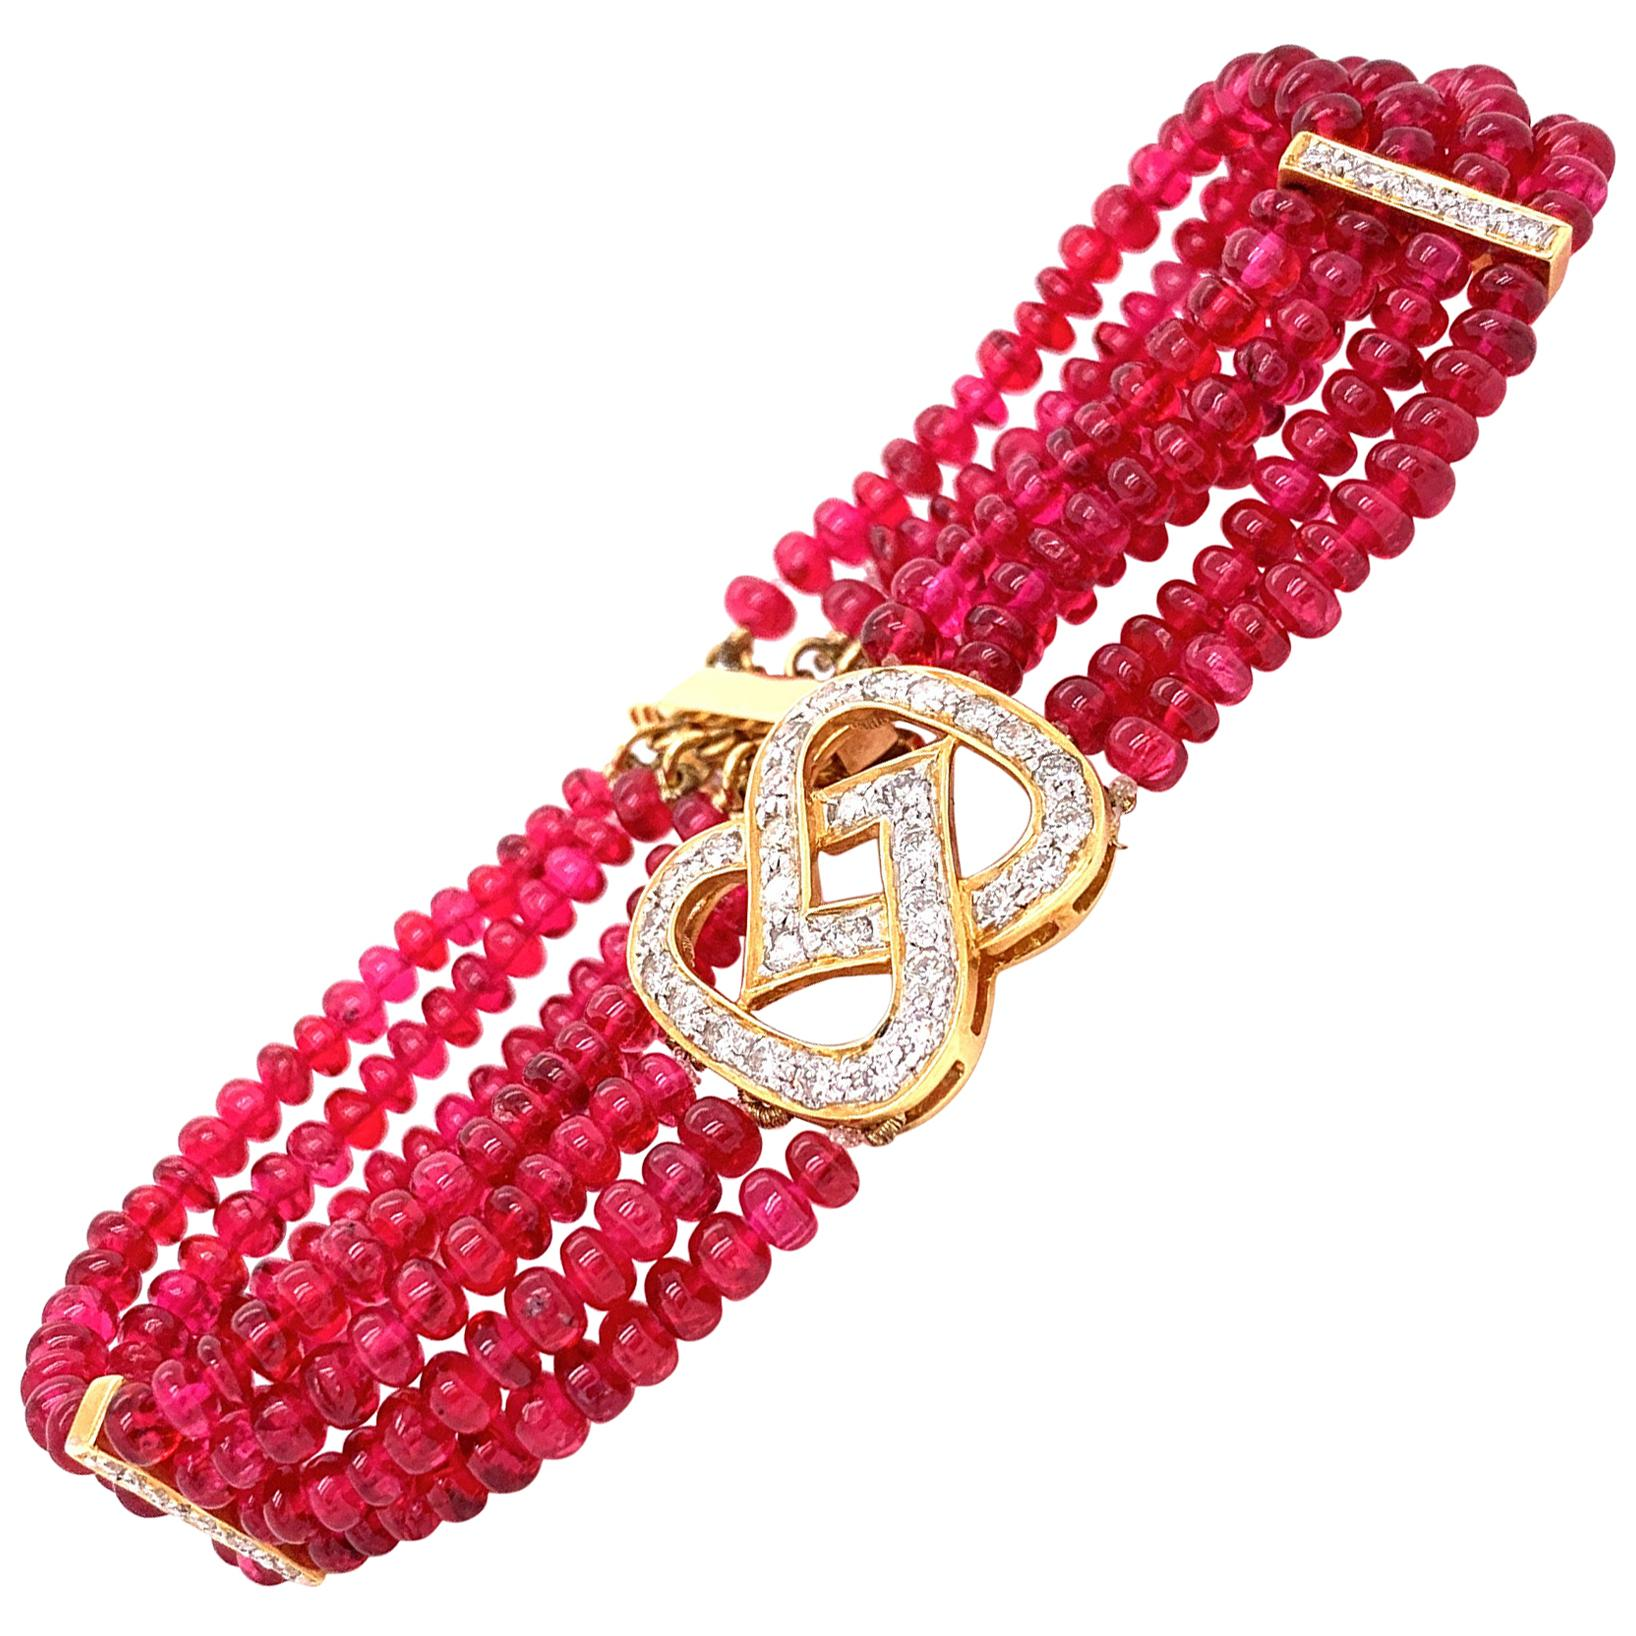 48 Carat Burmese Red Spinel Beads and White Diamond Gold Bracelet